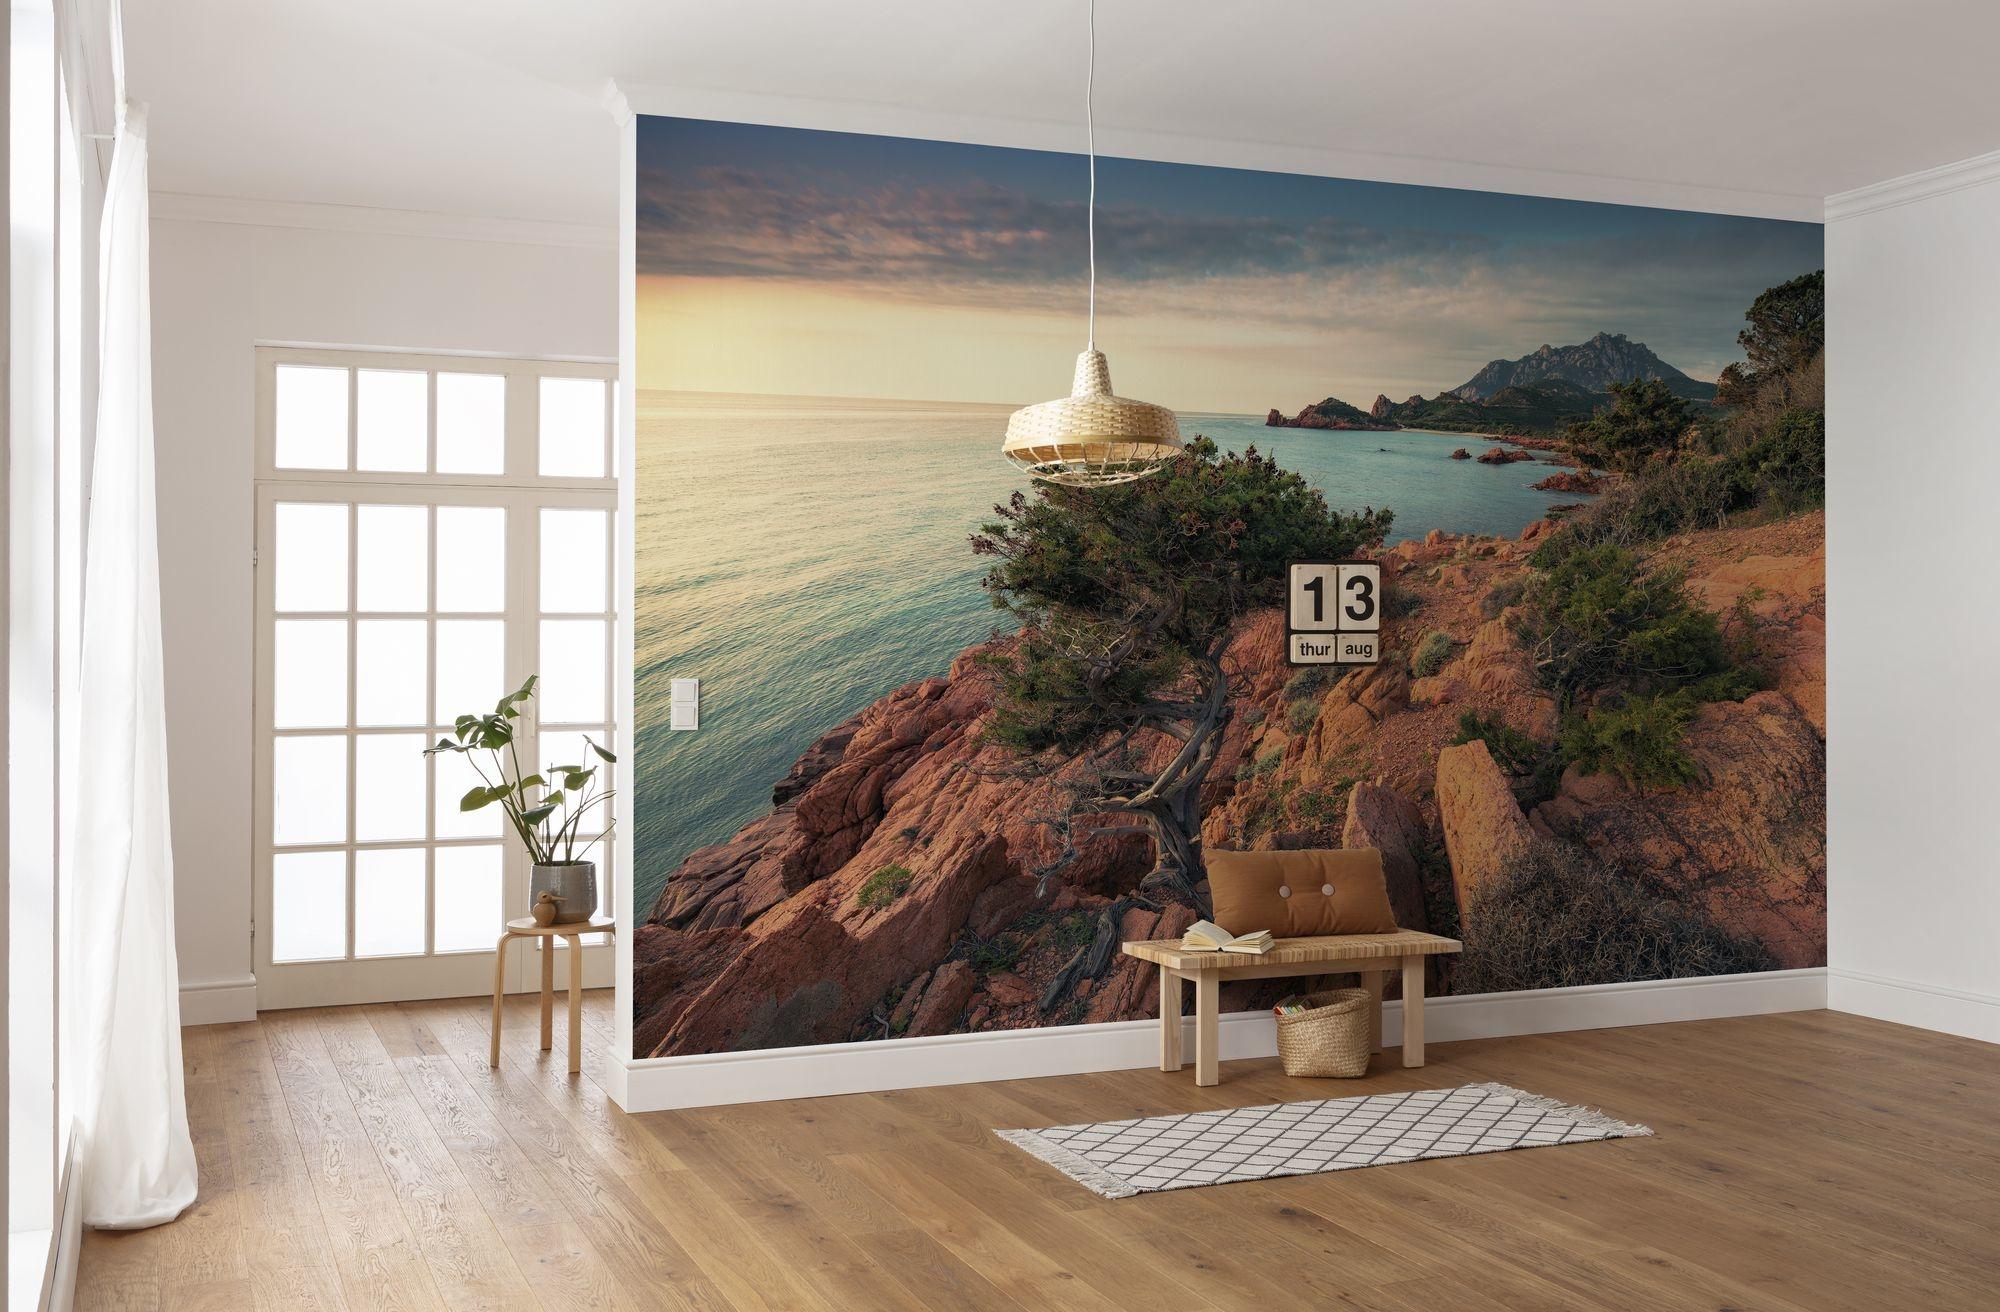 Stefan Hefele Edition 2 Fotobehang Komar - Natuur behang PARADISO II